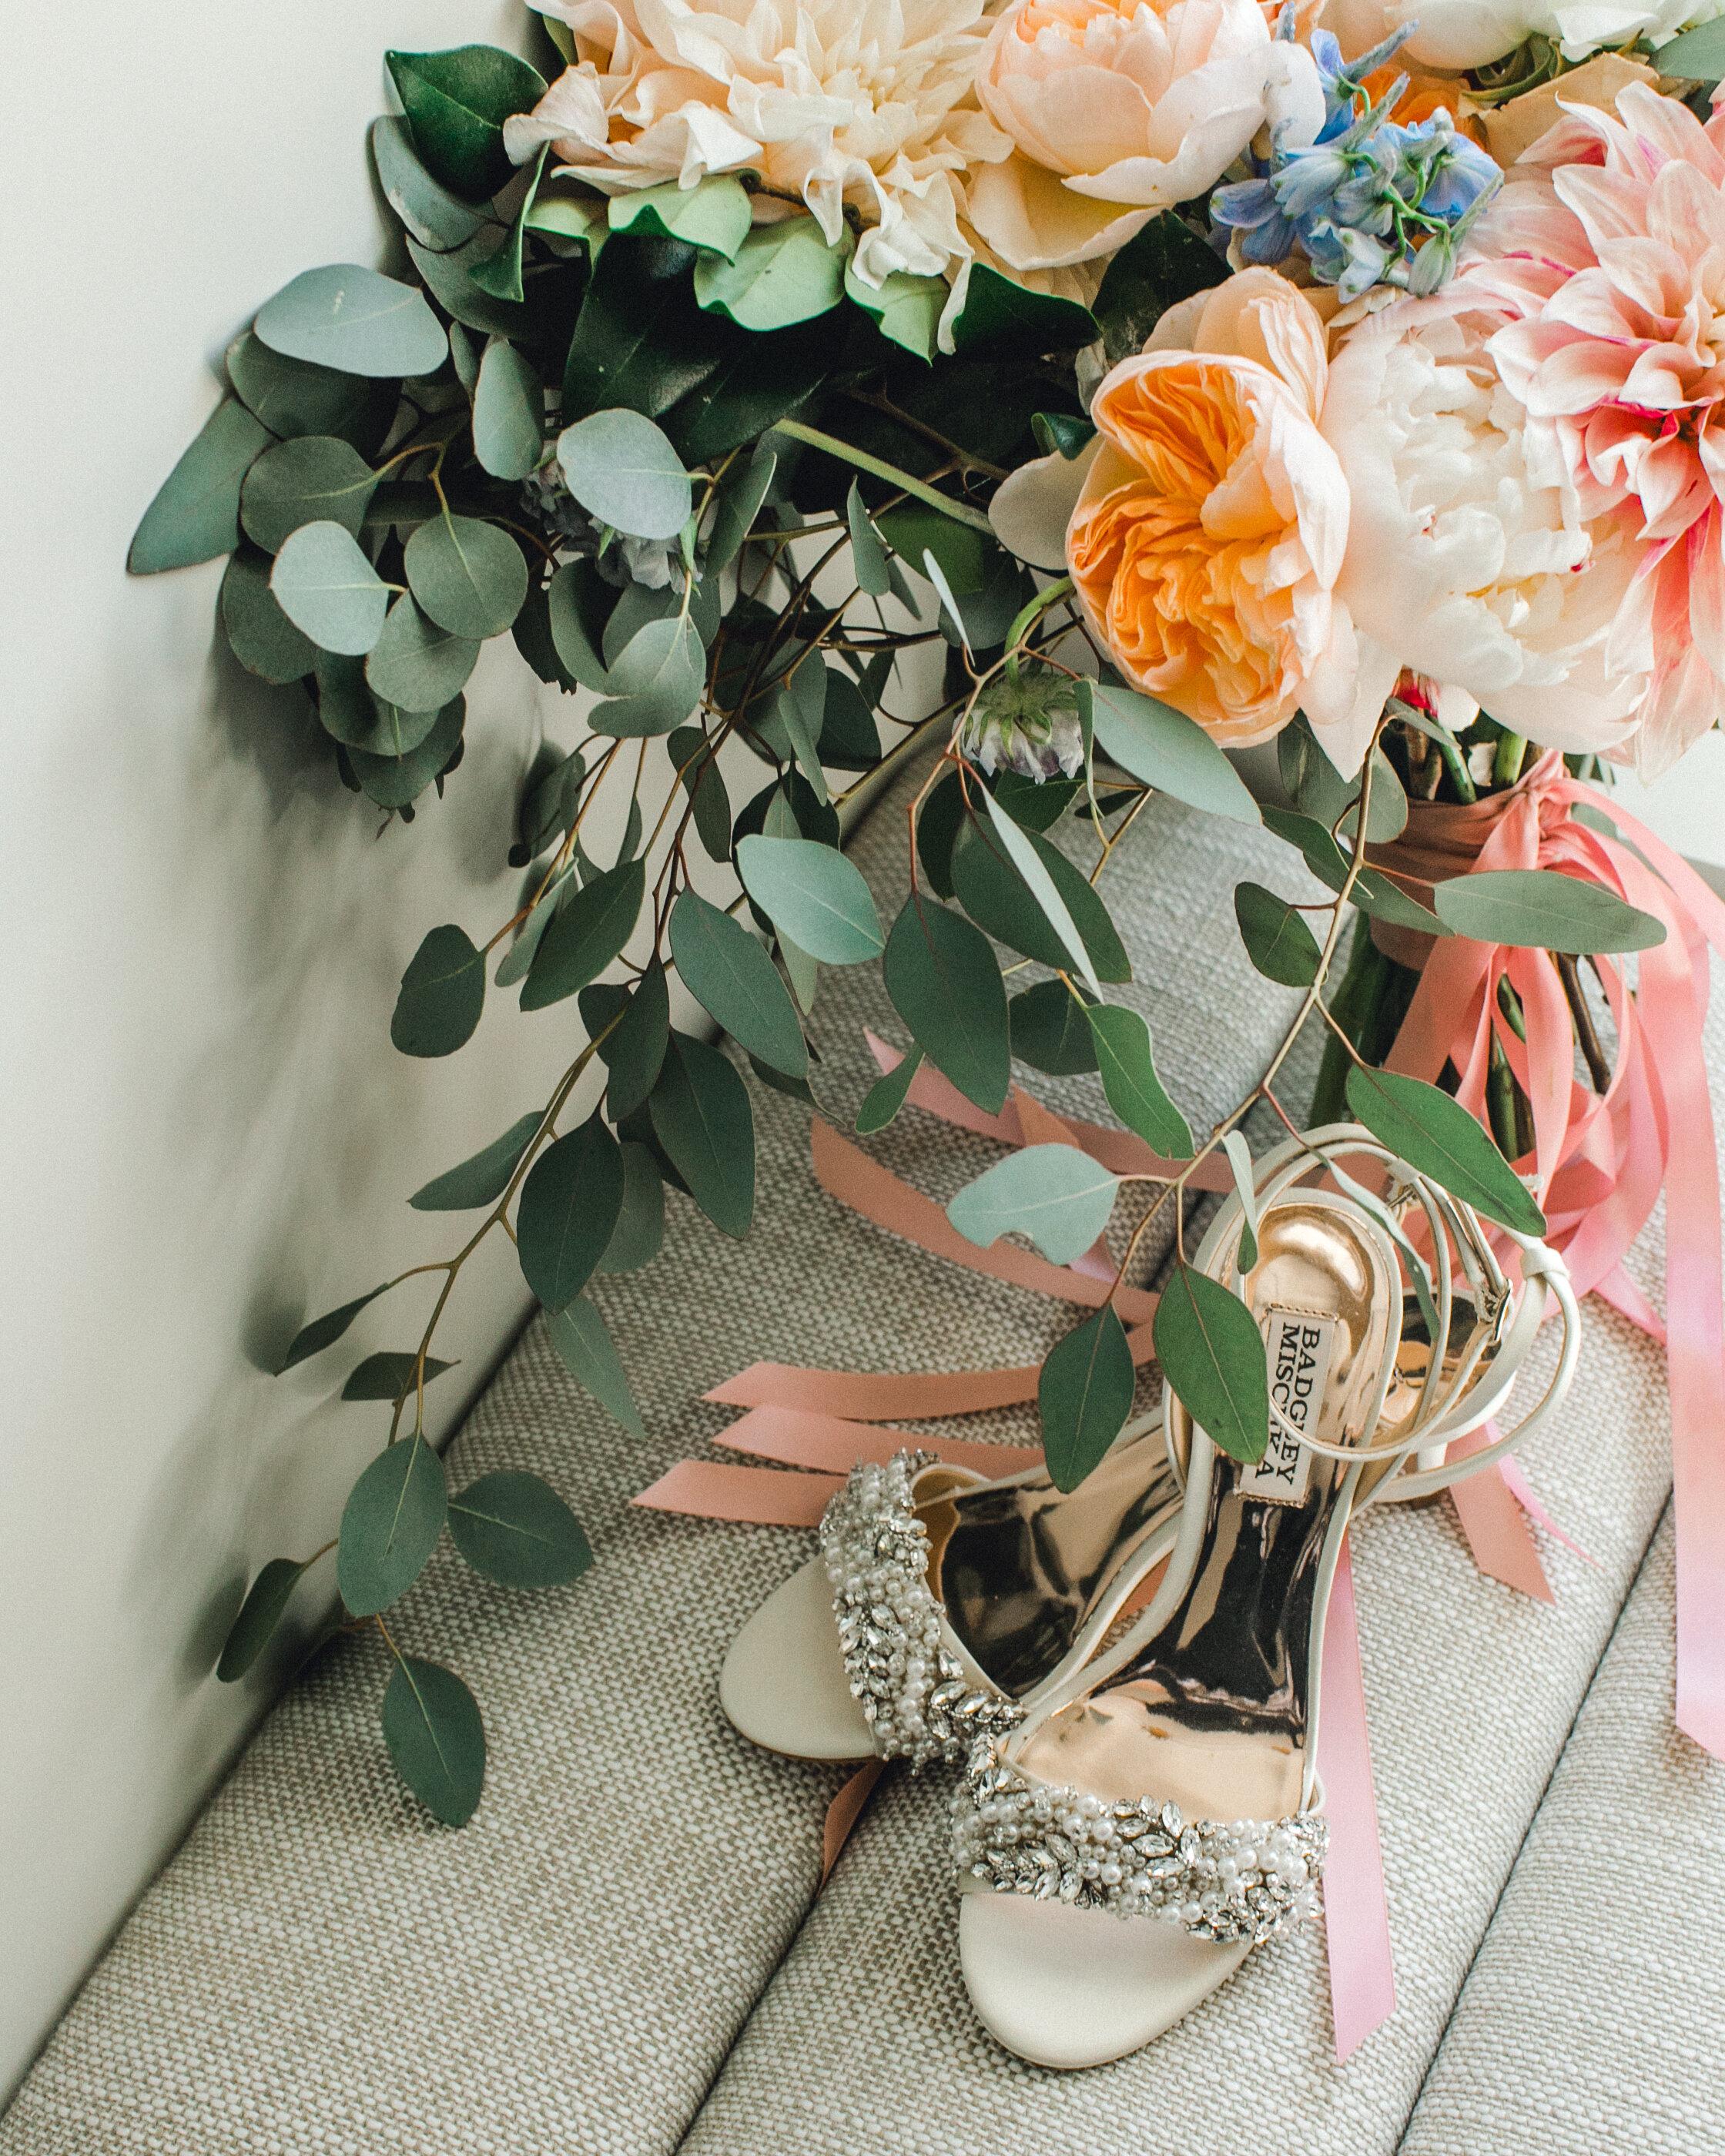 ivory-and-beau-blog-weddings-ivory-and-beau-couple-dominique-and-andres-savannah-florist-wedding-planning-savannah-bridal-boutique-wedding-flowers-KIP_WEBERWEDDING_RAILROADMUSEUM-27.JPG